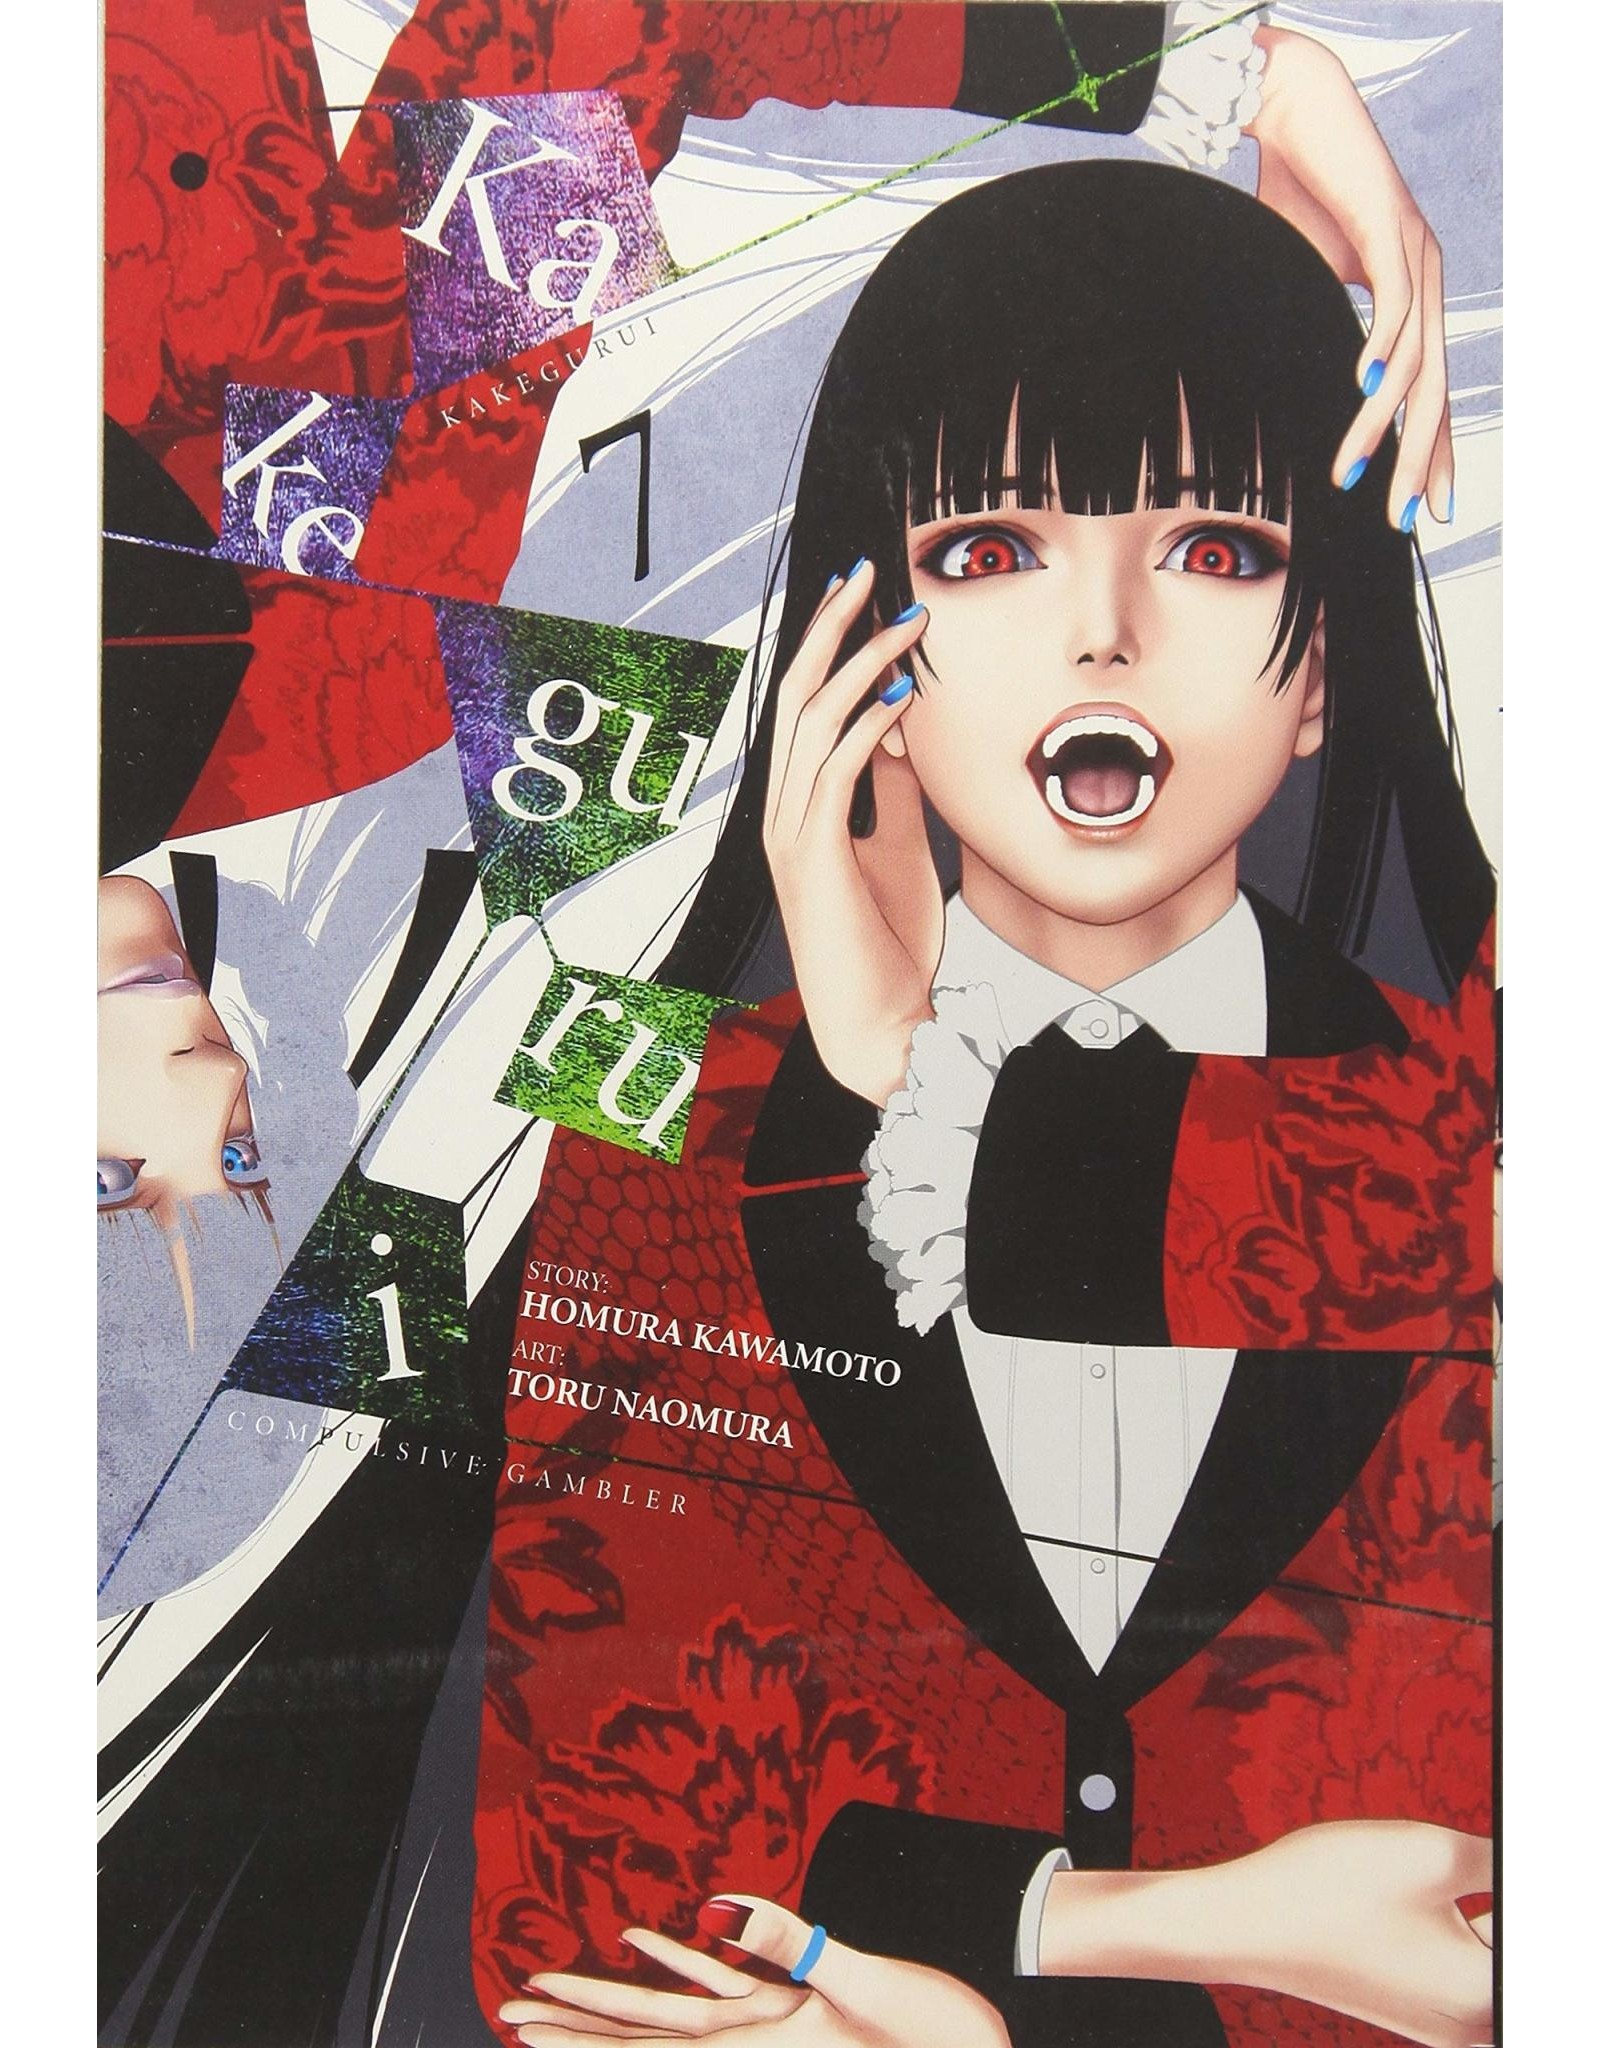 Kakegurui: Compulsive Gambler 7 (English)